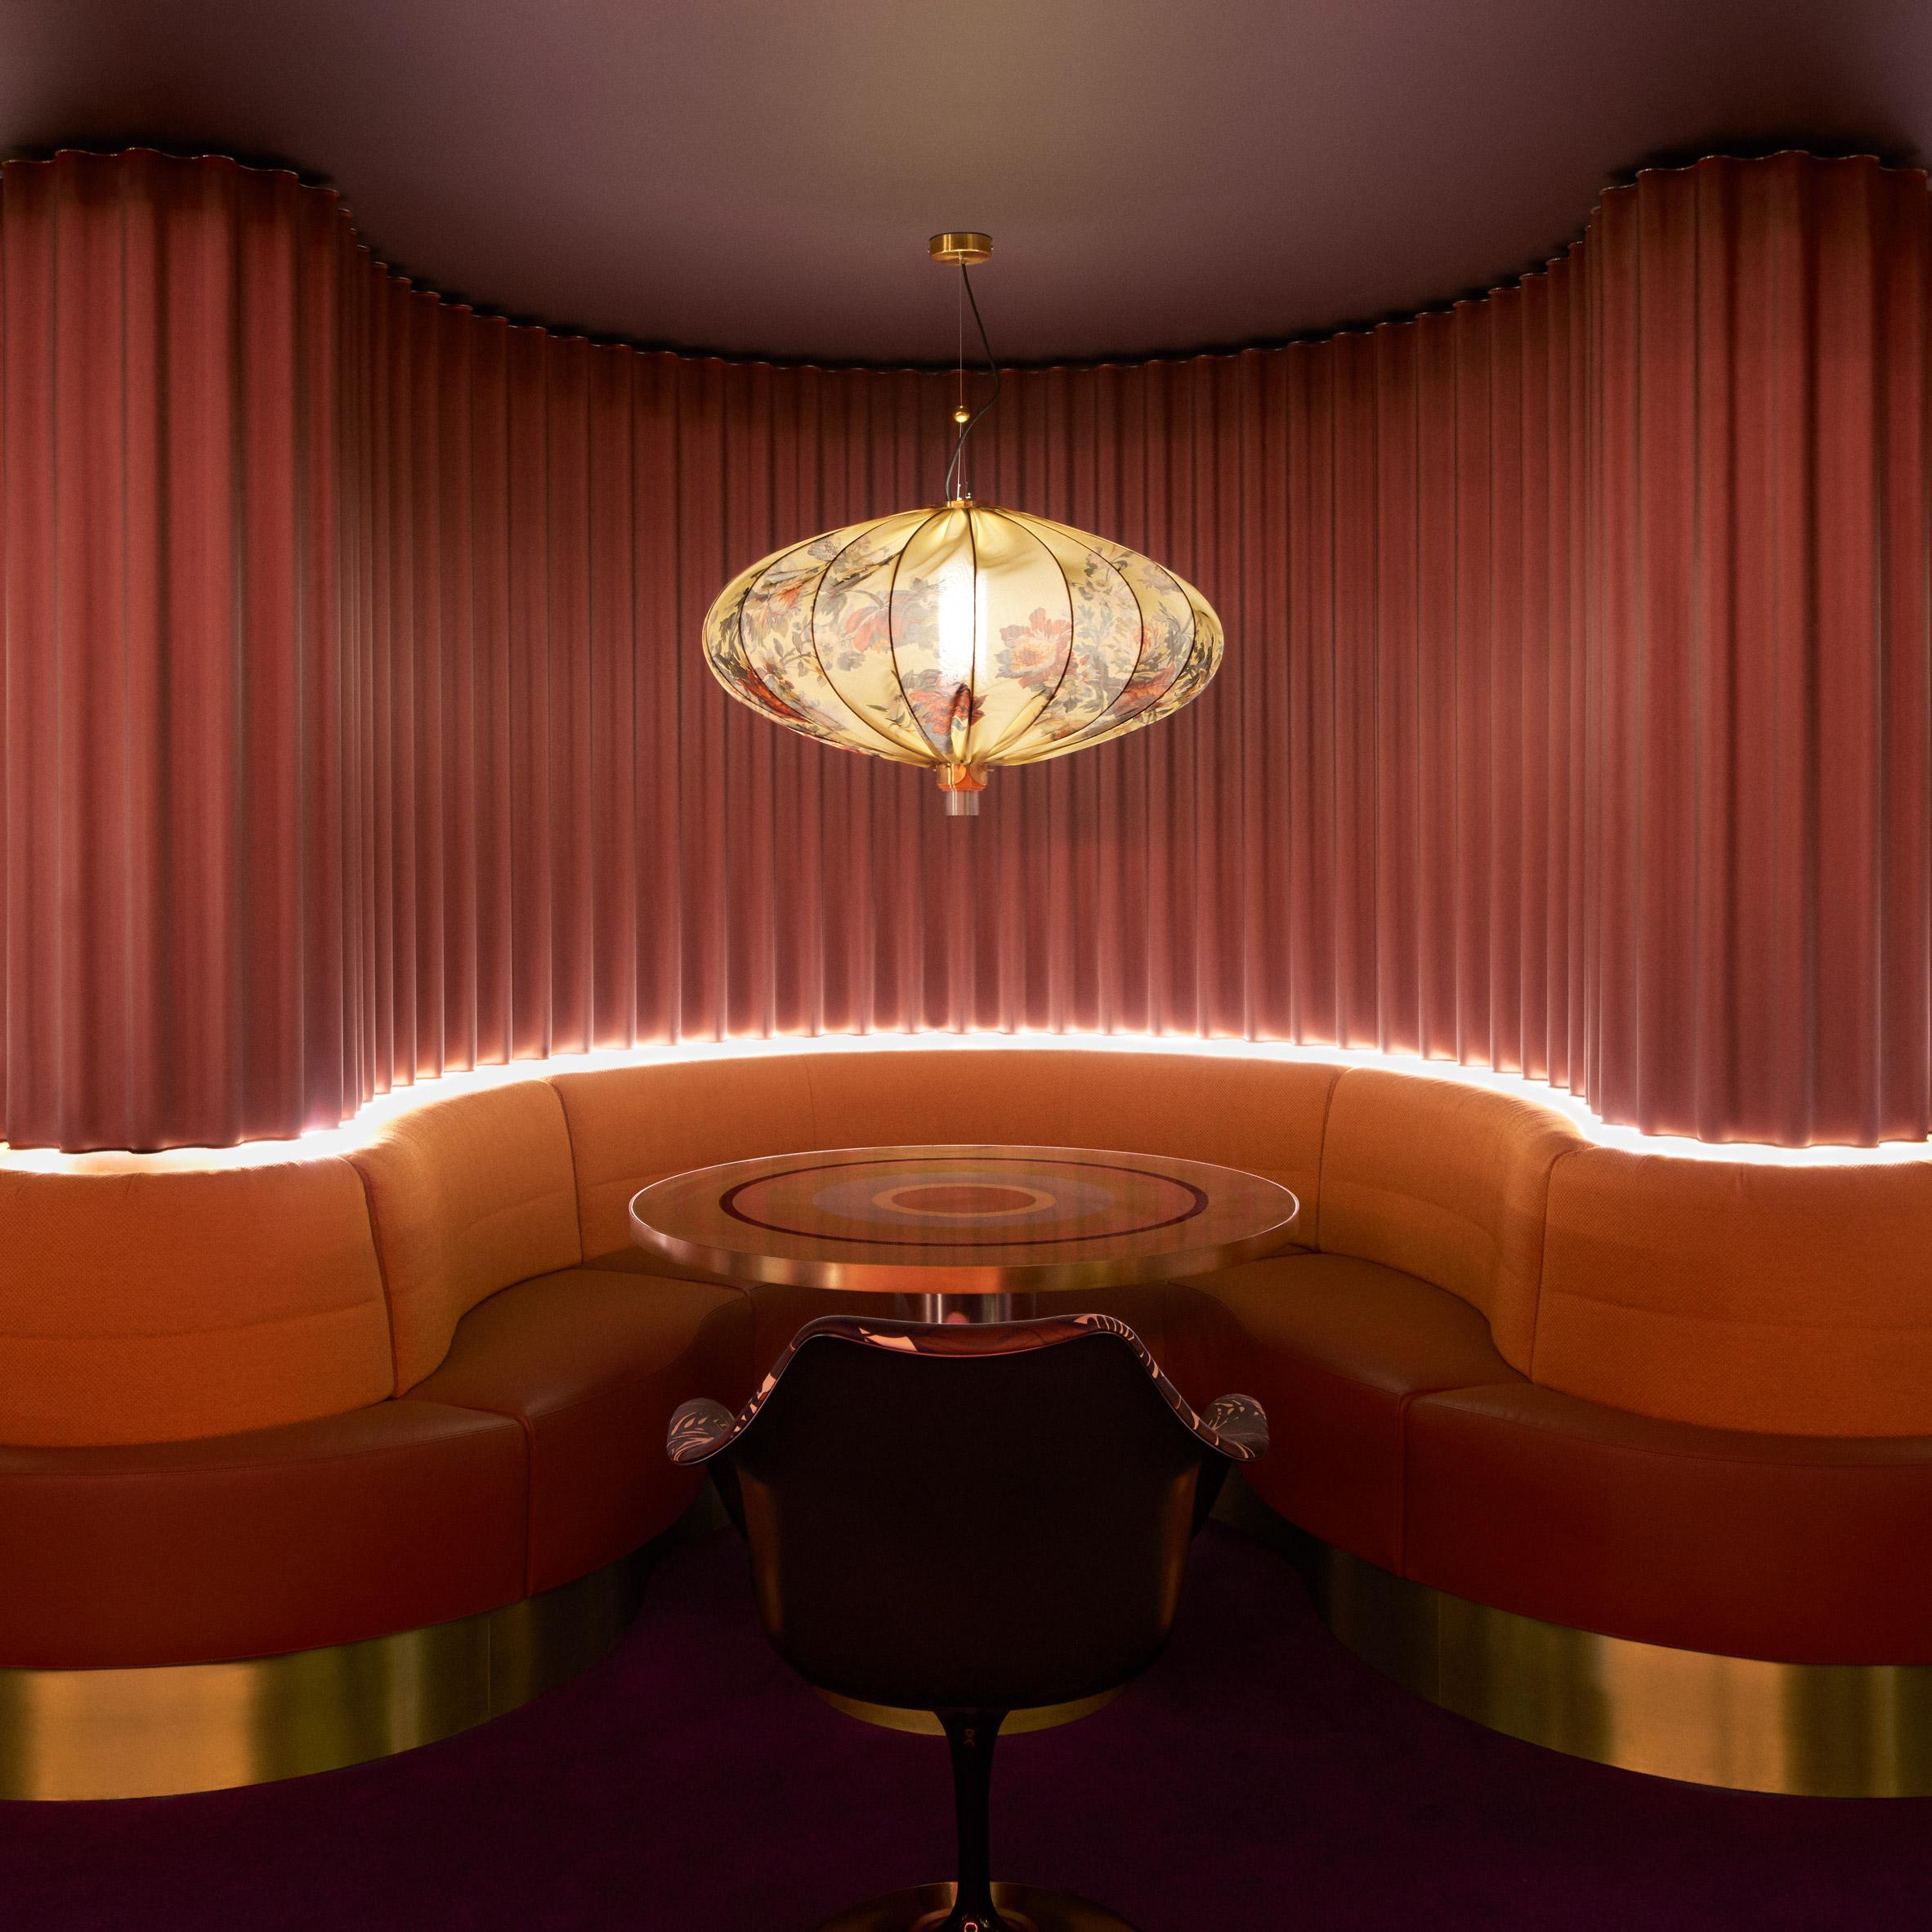 Interior Design Jobs Including Roles At Dimore Studio And Joyce Wang Studio